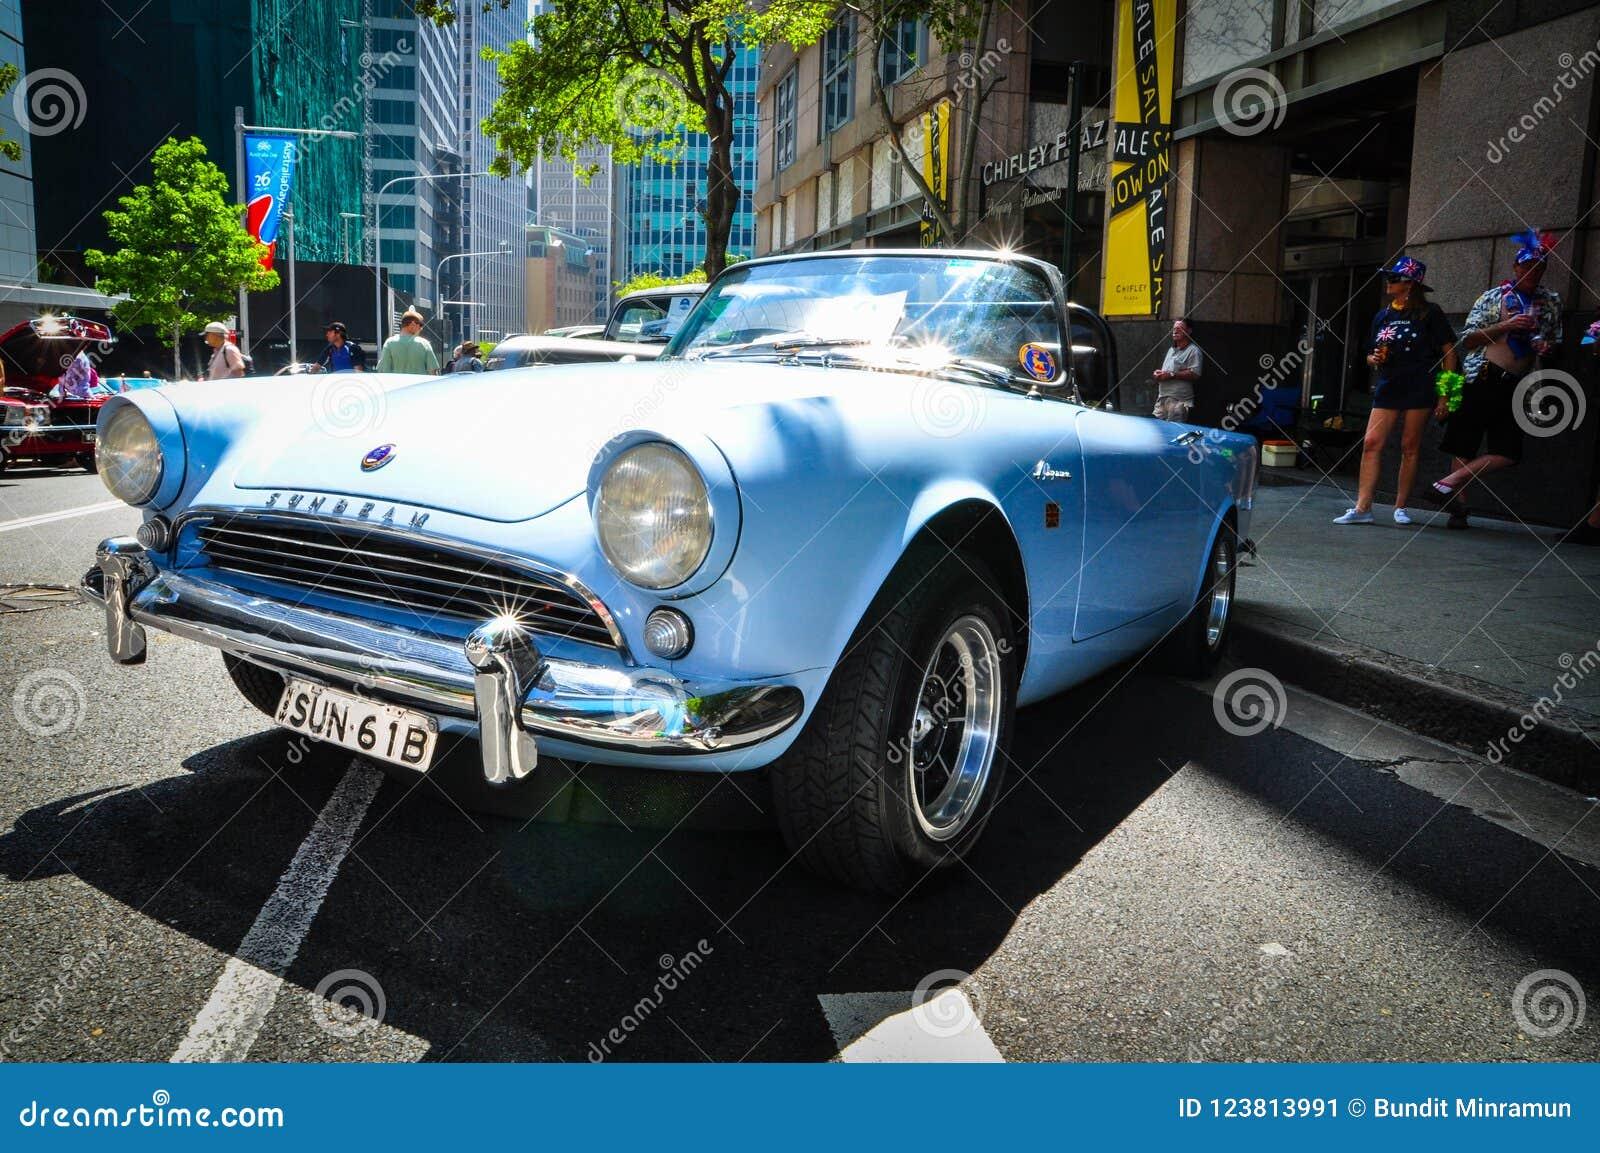 Blue Sunbeam Vintage Car In Classic Motor Show On Australia Day